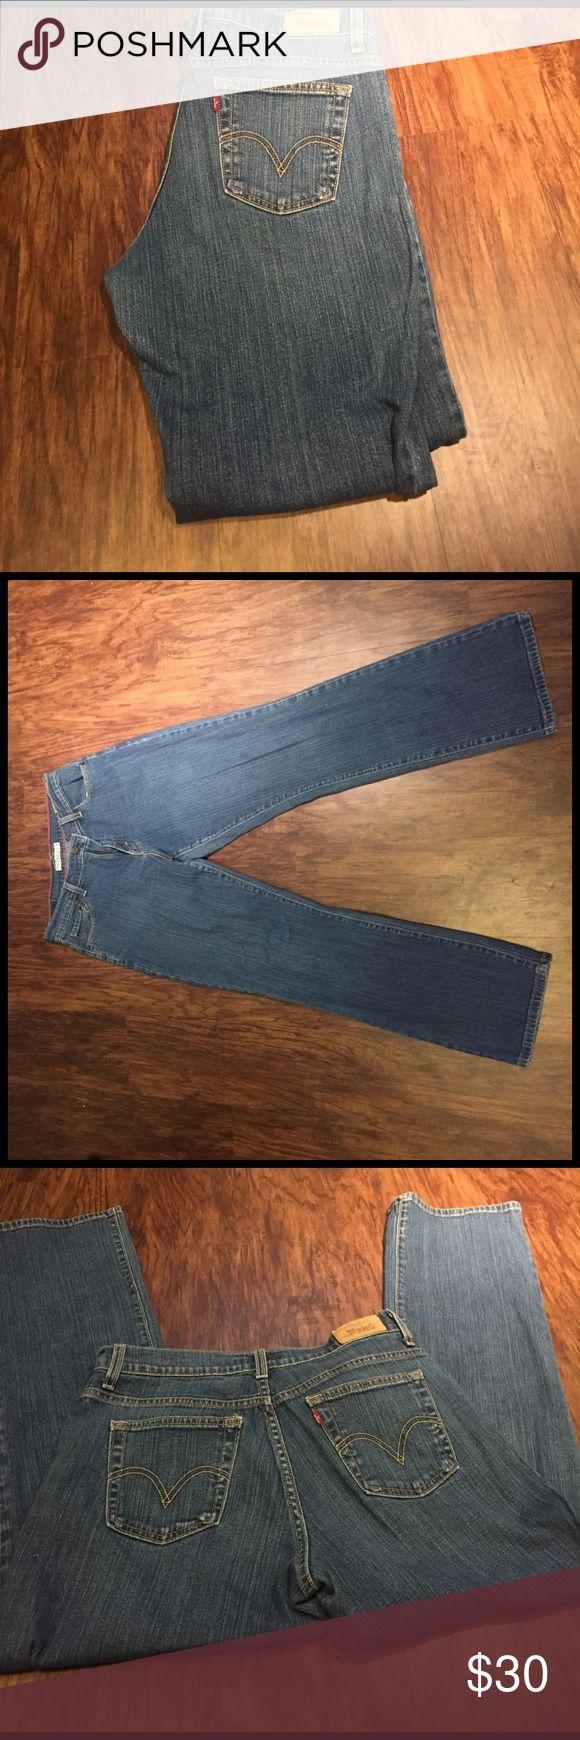 "Levi's 550 relaxed bootcut Levi's 550 relaxed bootcut high waist inseam 30"" Levi's Jeans Boot Cut"